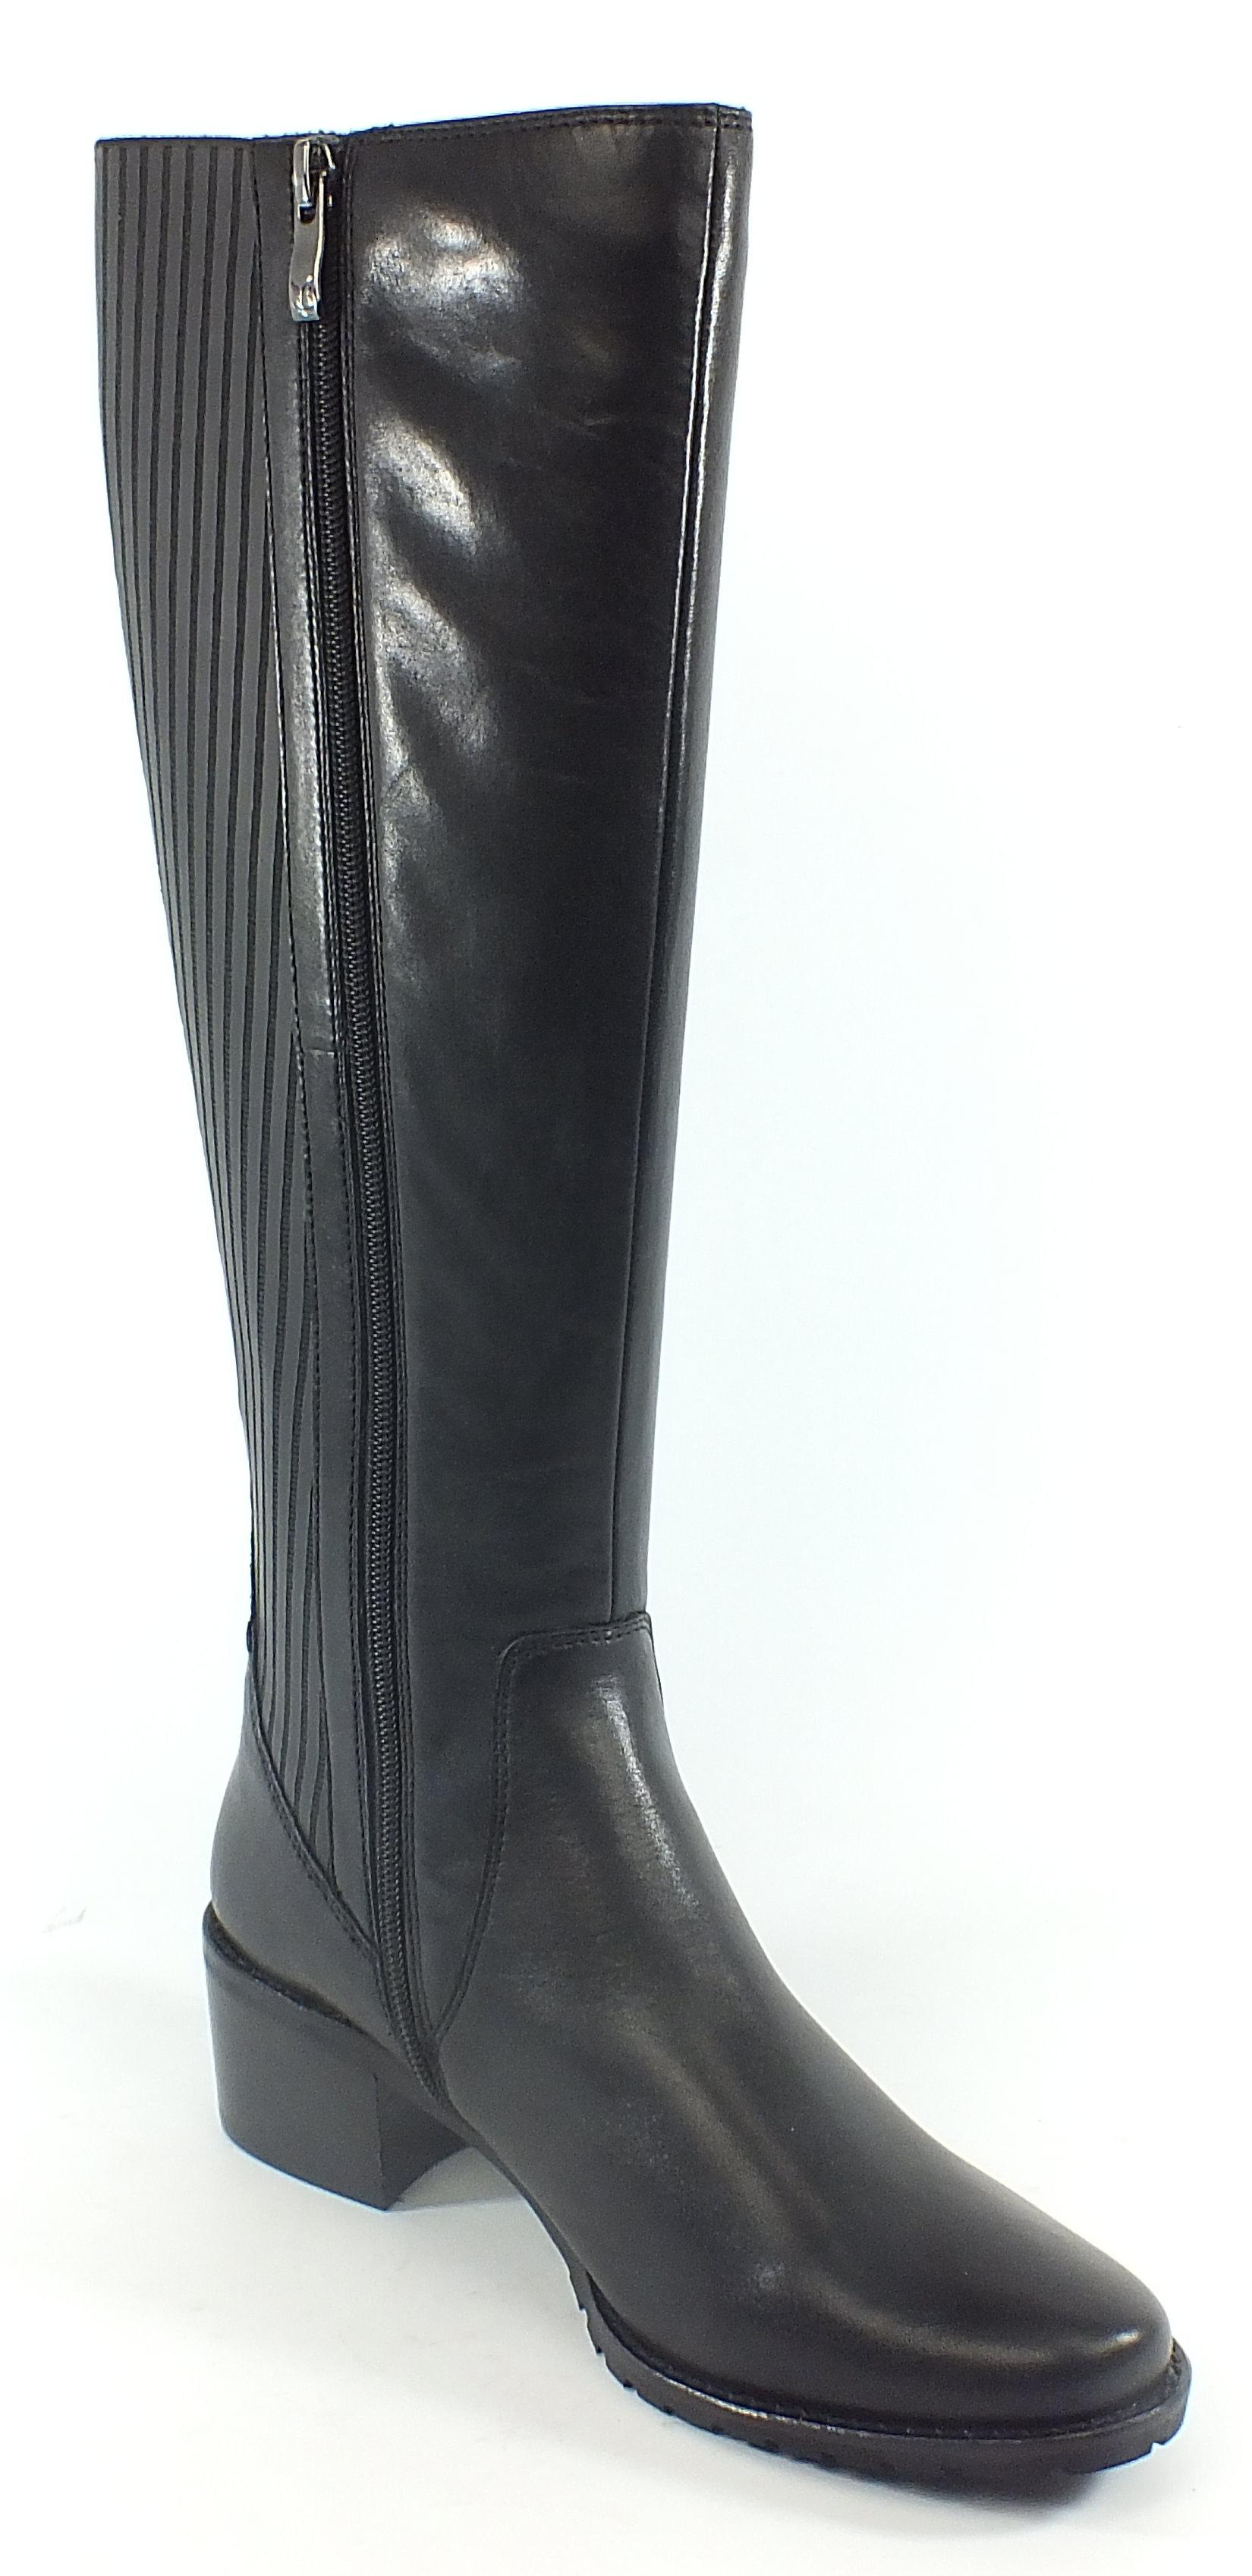 caprice stretch leder stiefel boots schwarz dehnbar xs. Black Bedroom Furniture Sets. Home Design Ideas